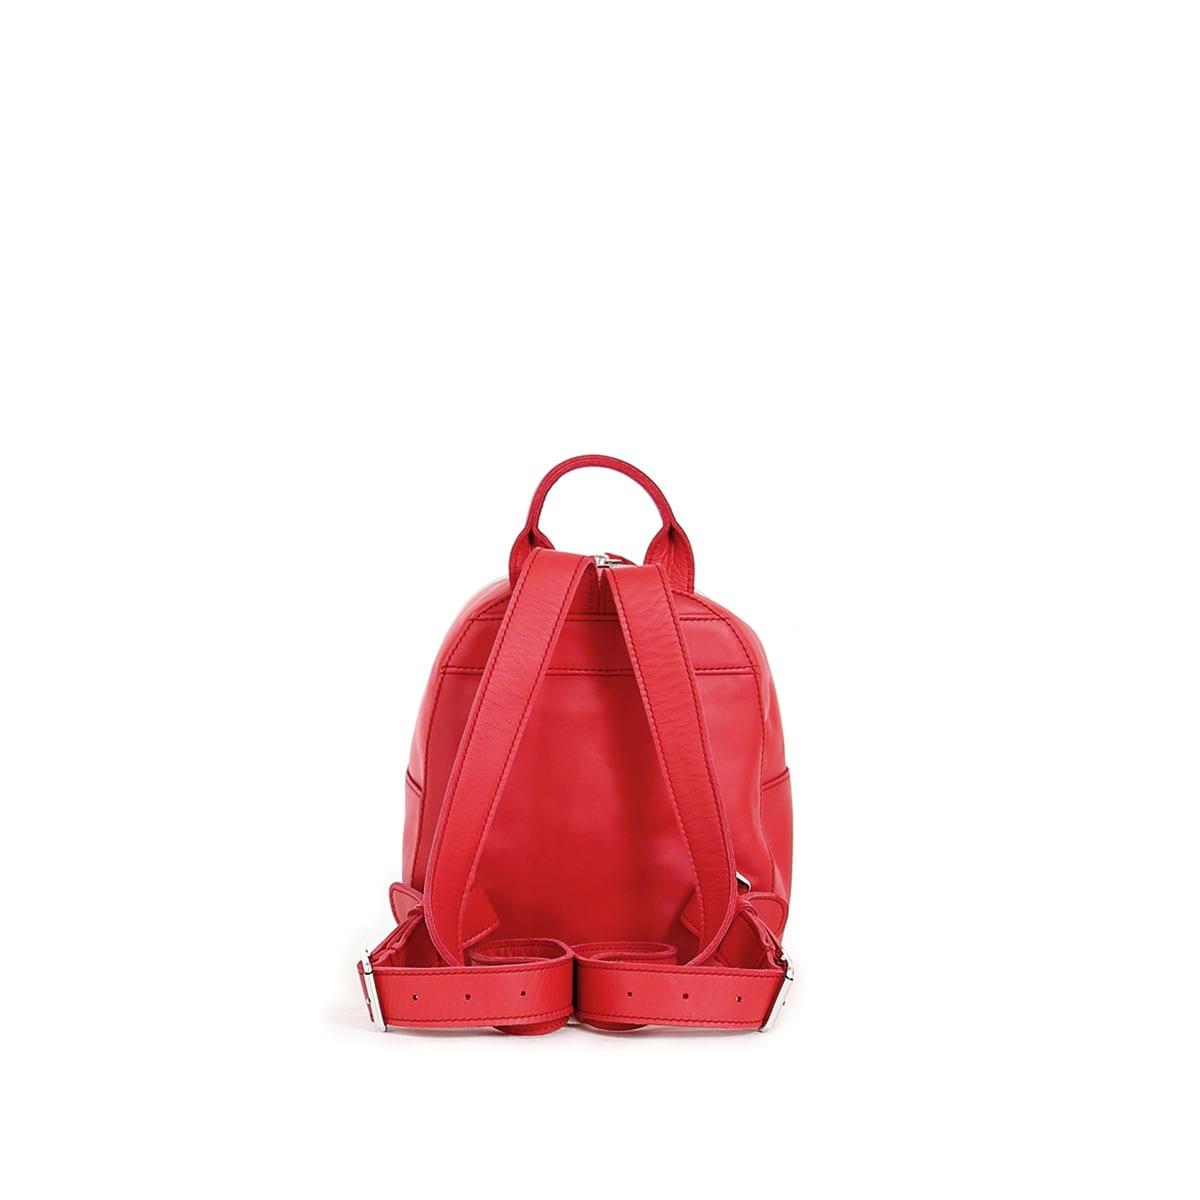 a725c4088f Kerttu Mini Backpack Red – Lumi Accessories